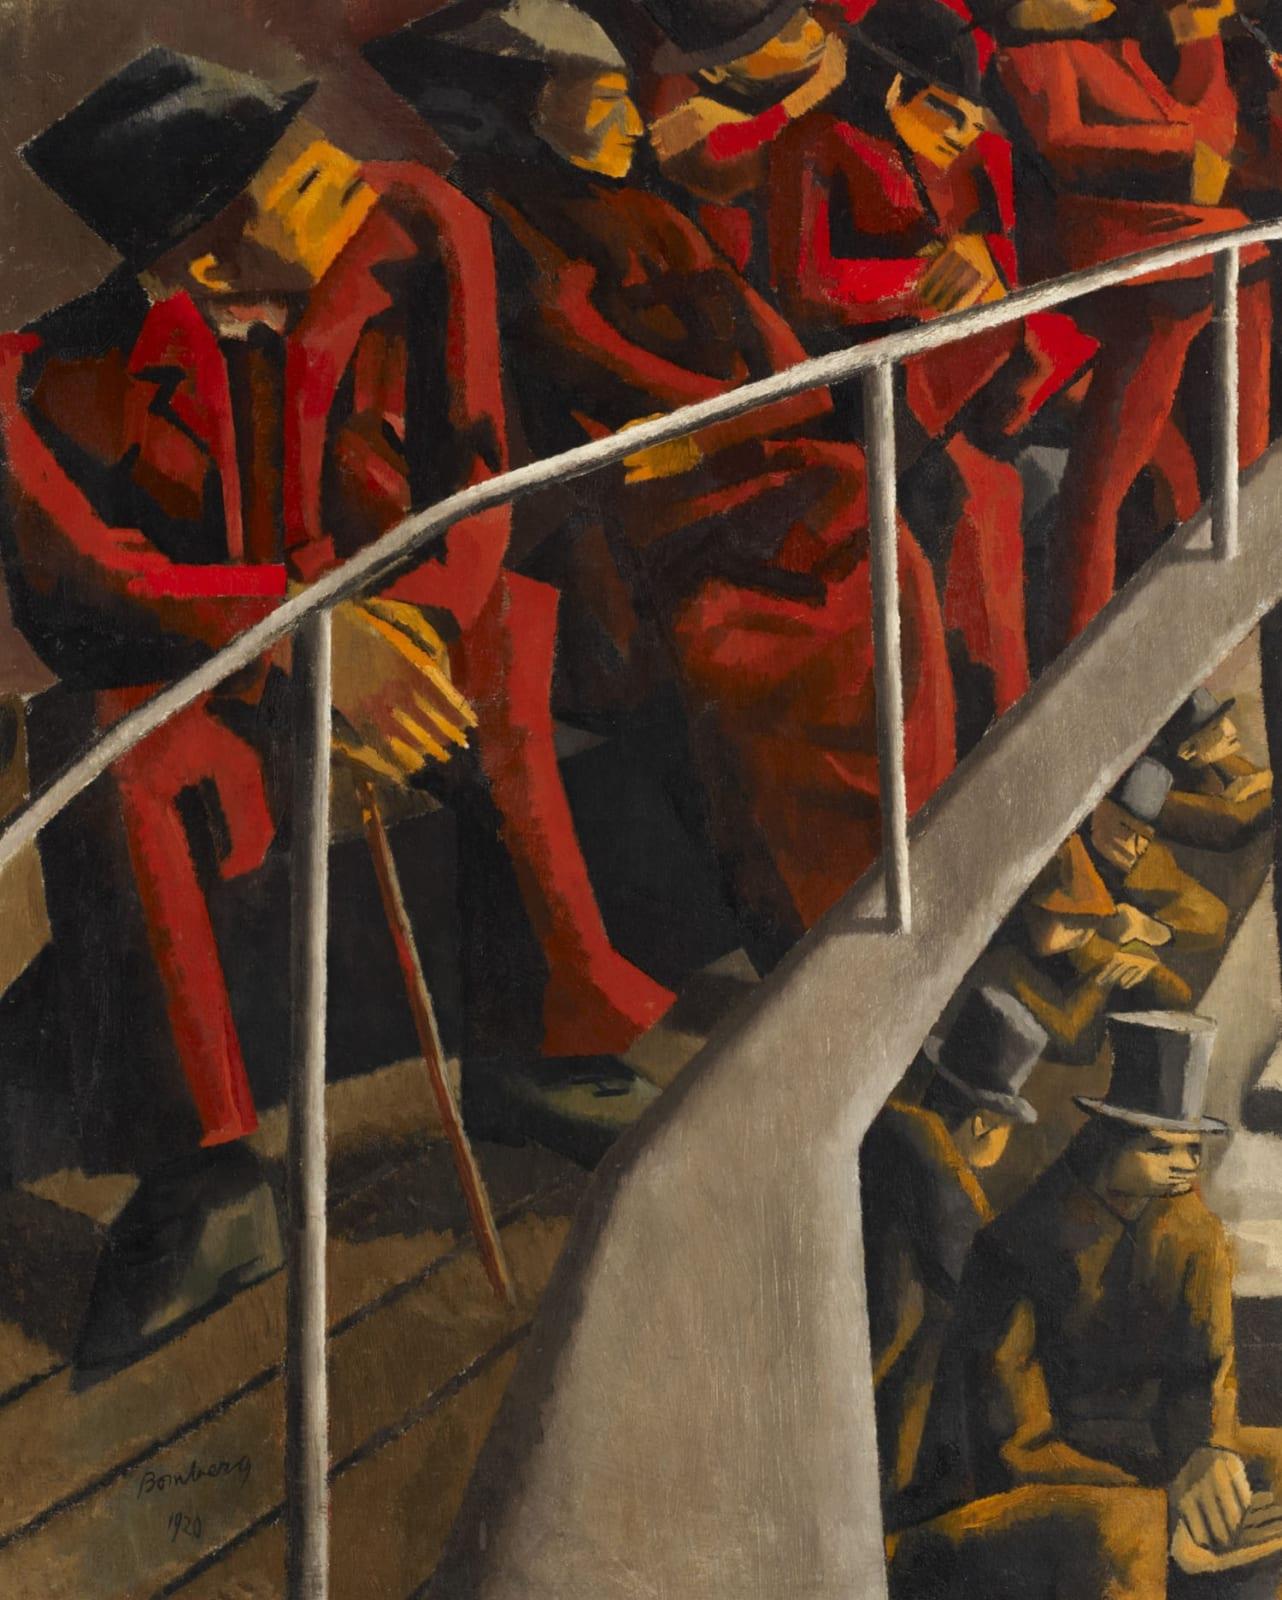 Ghetto Theatre by David Bomberg (1890-1957), 1920. Oil on canvas.